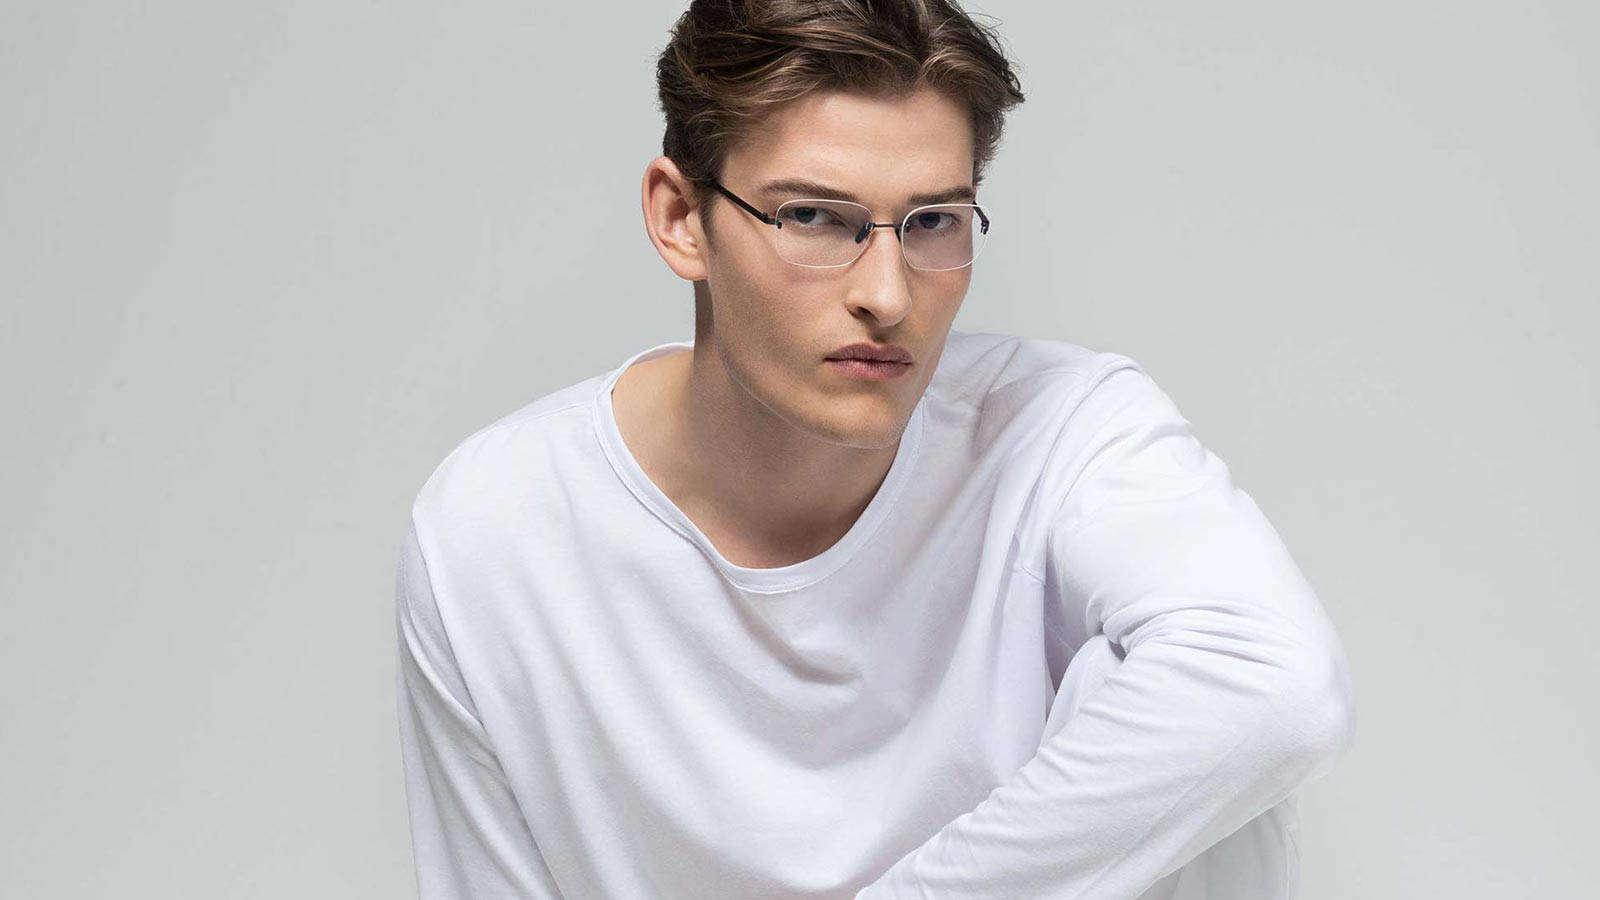 Mens rimless glasses